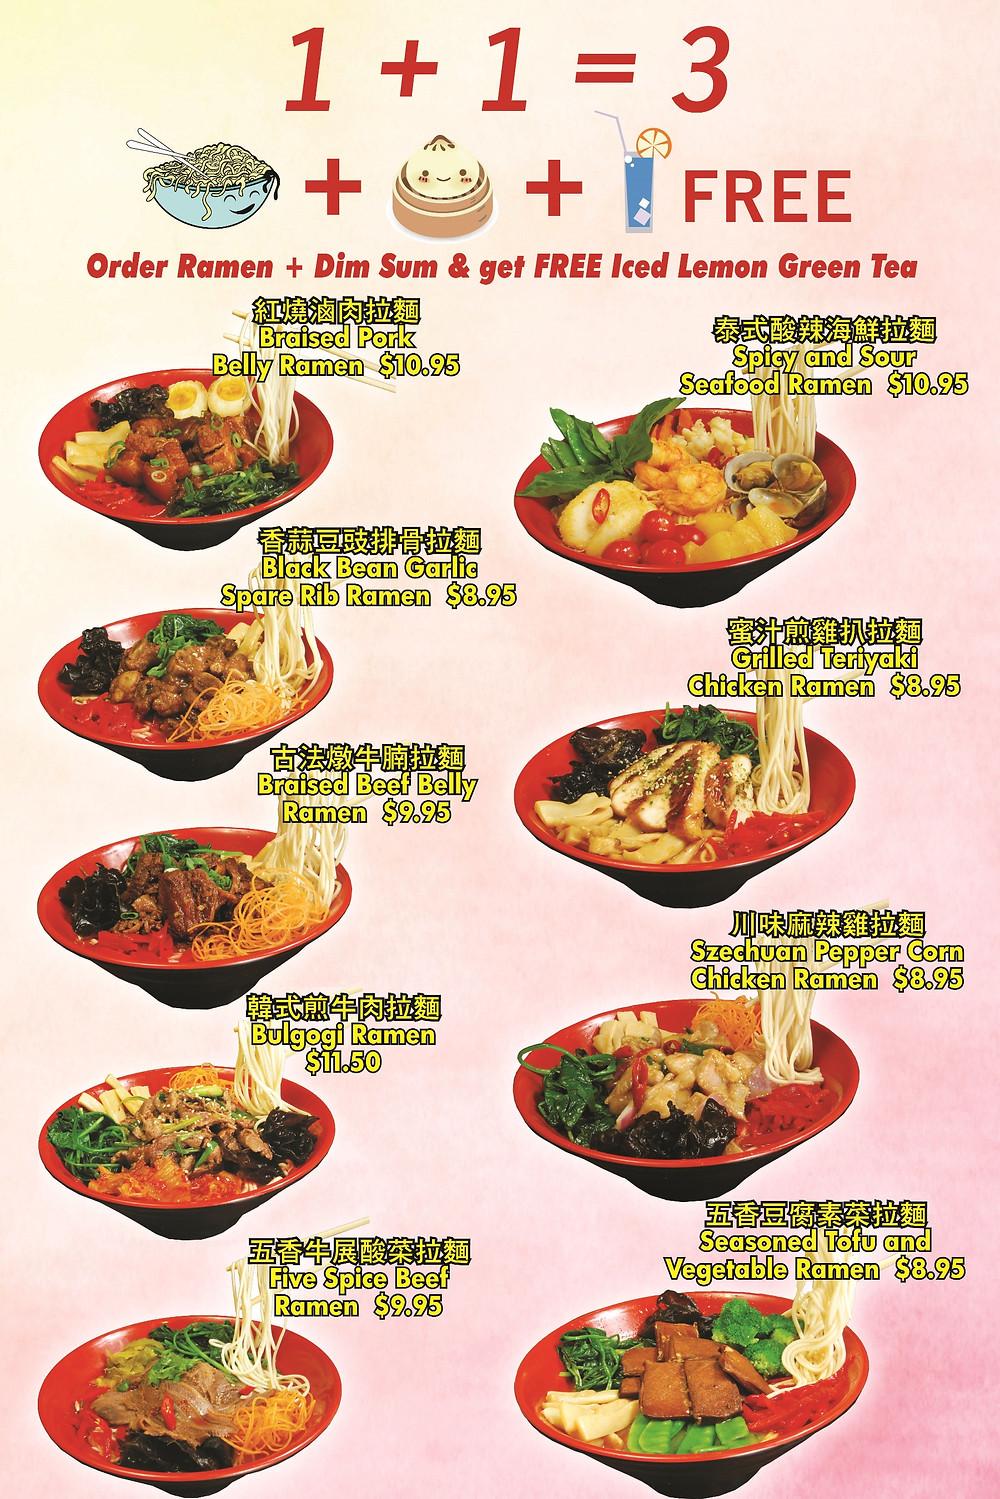 Order Ramen + Dim Sum and get Free Iced Lemon Green Tea